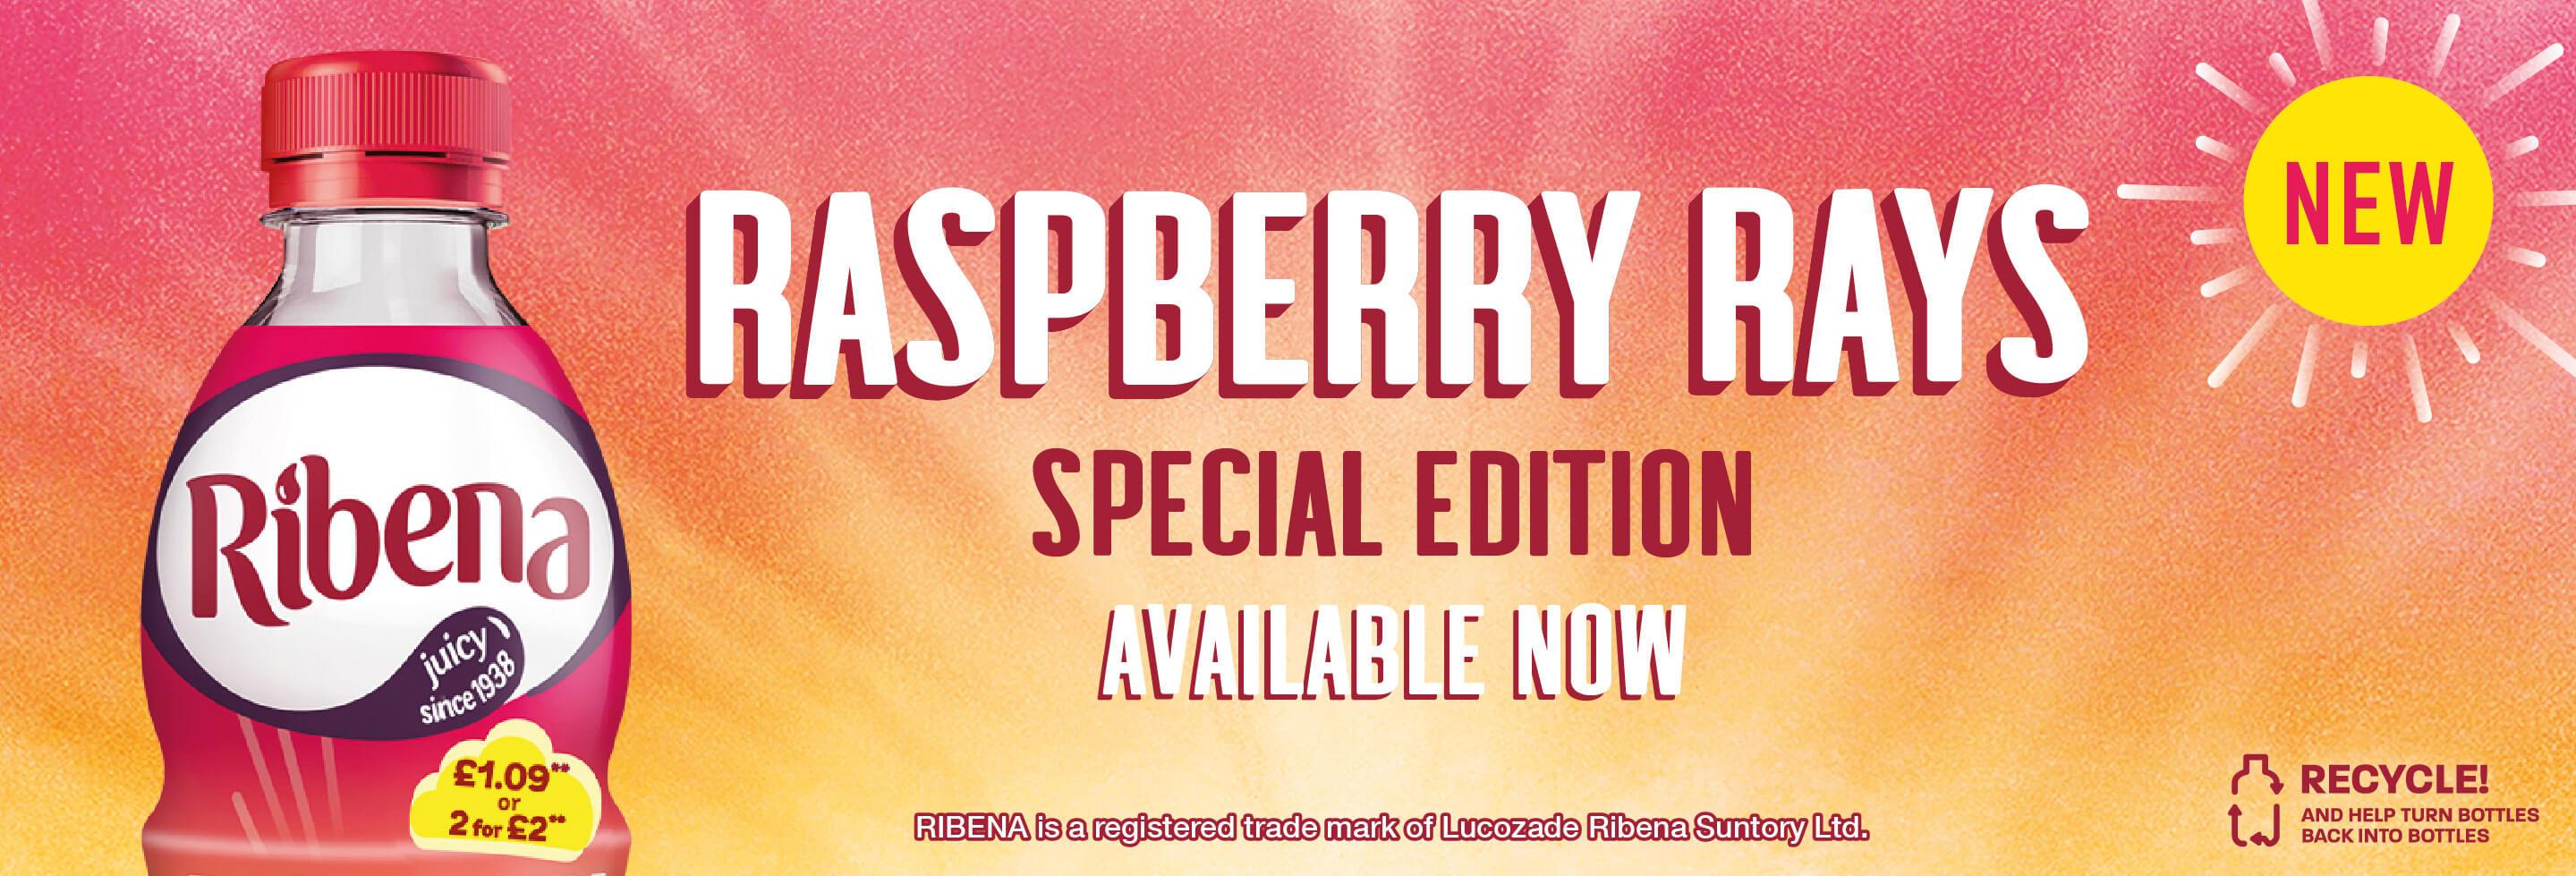 Ribena Raspberry